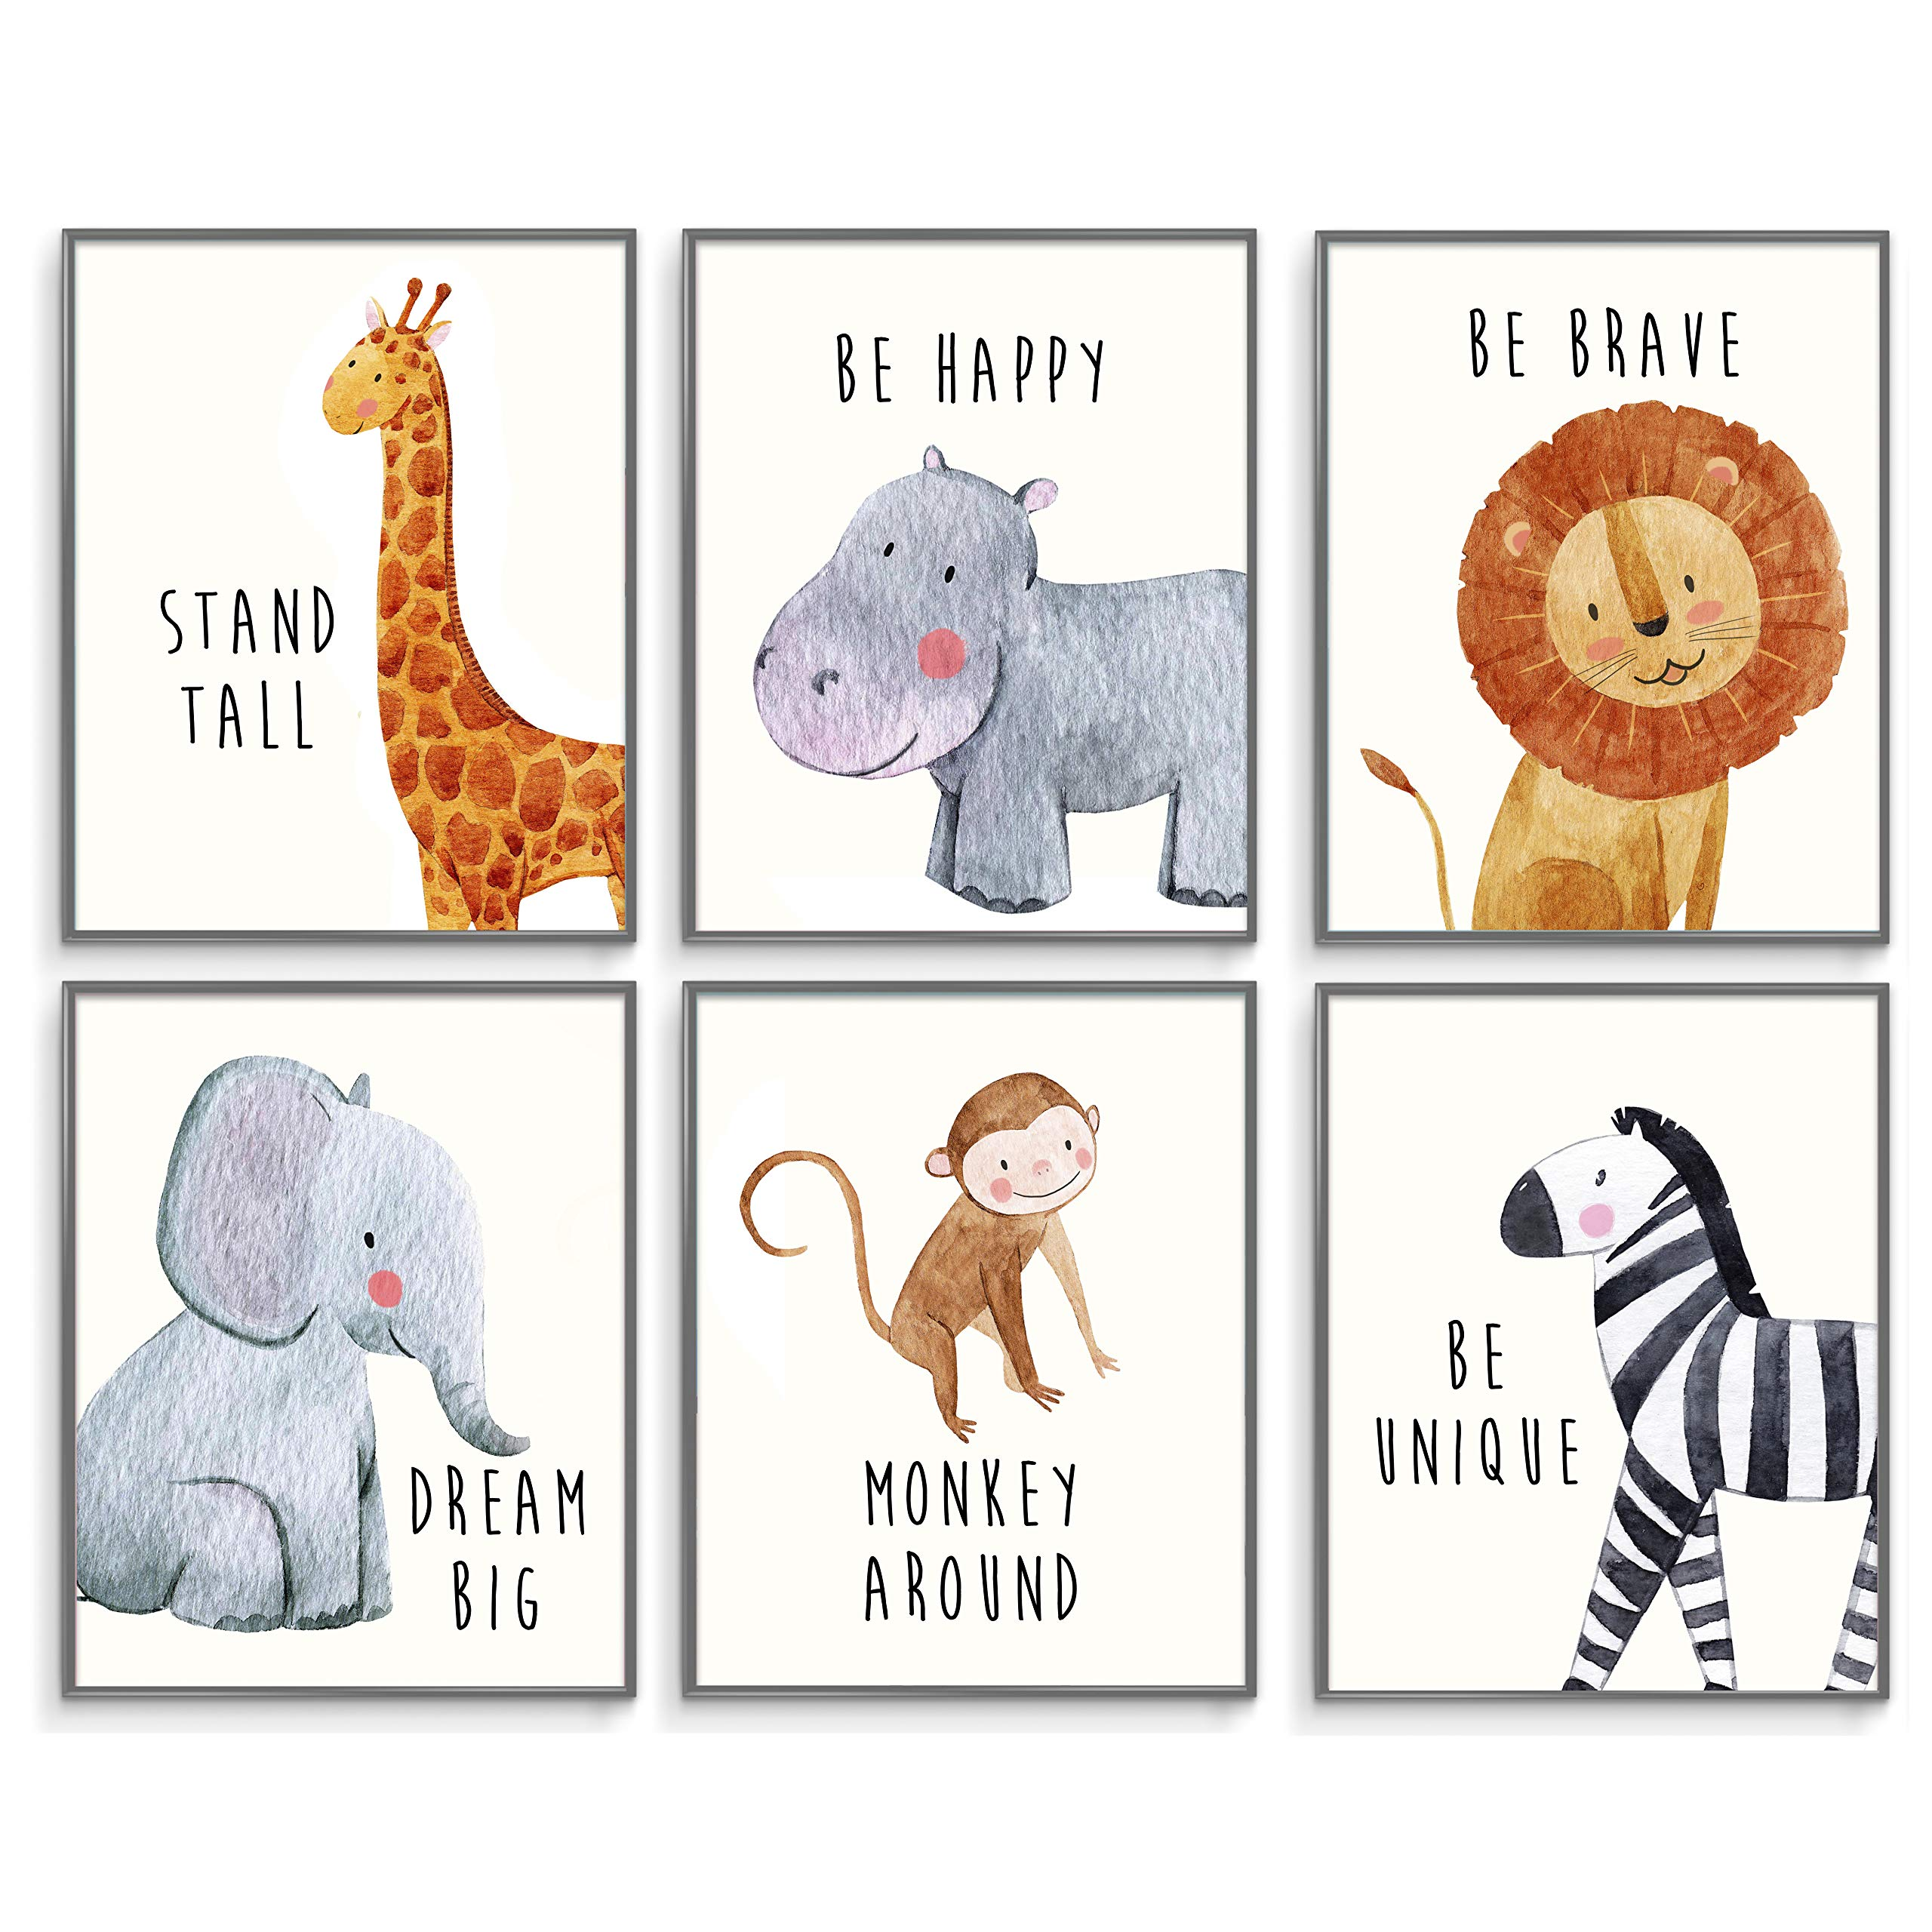 Safari Baby Animals, Baby Nursery Decor, Baby Room Decor, Playroom Wall Art Decor Prints, Boys & Girls Room, Kids Bedroom Inspirational Quotes, Motivational Art, Inspirational Art. Set of 6 8x10in. by Throwback Traits